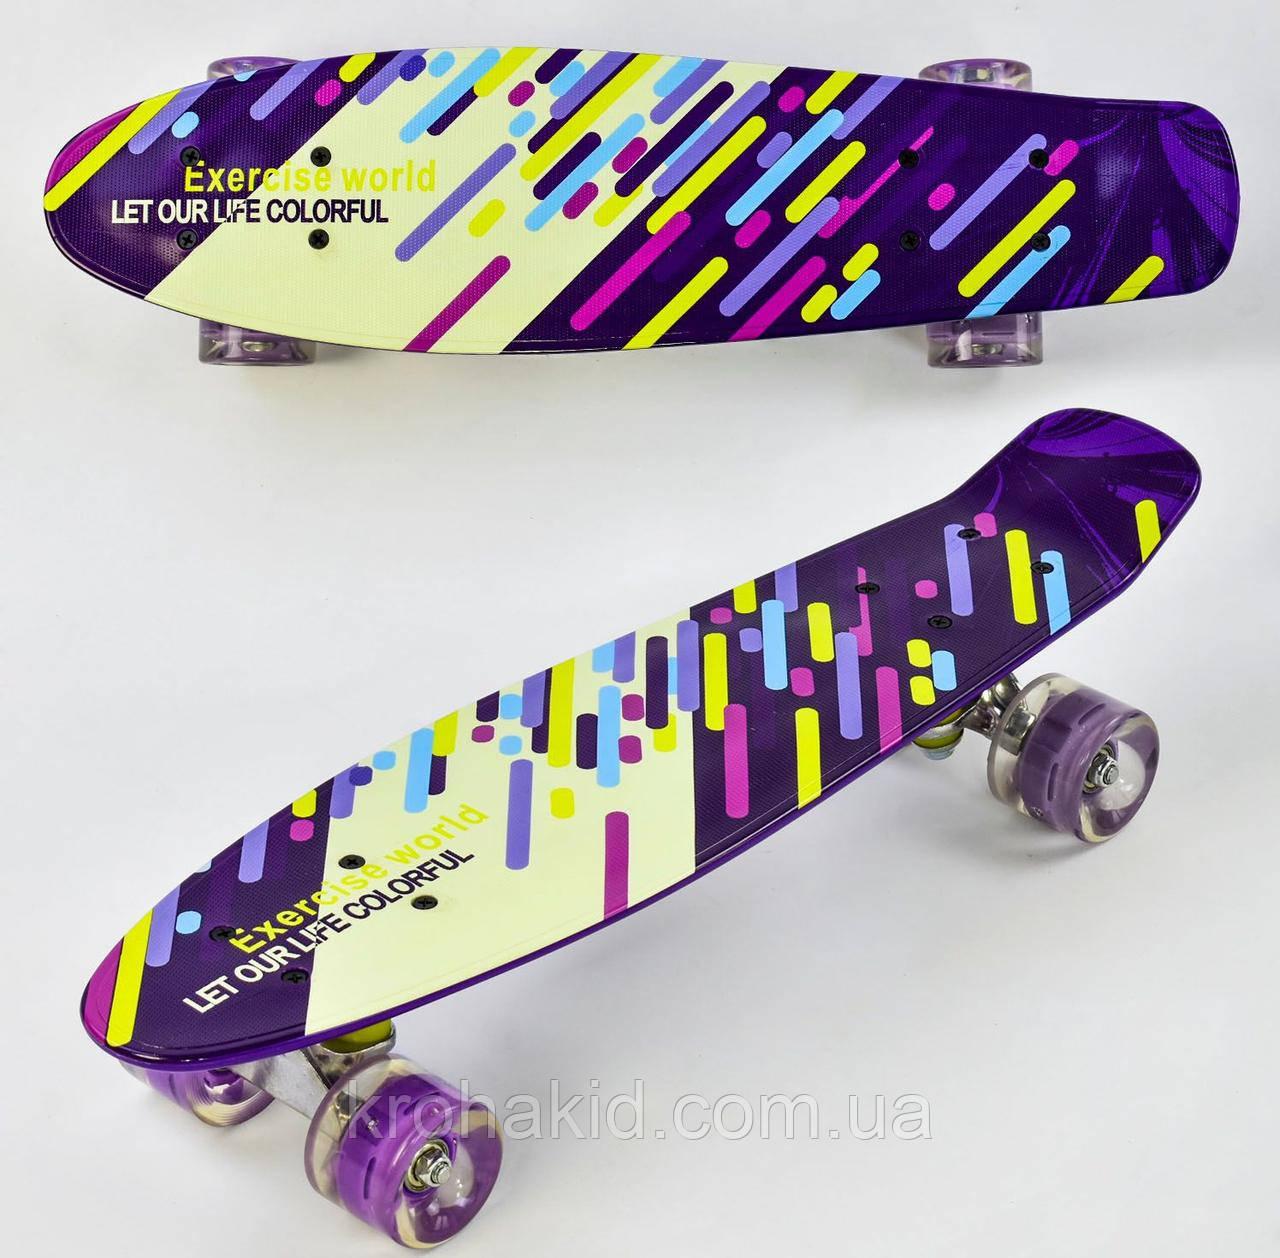 Скейт F 9797  Best Board, доска=55см, колёса PU, СВЕТЯТСЯ, d=6см